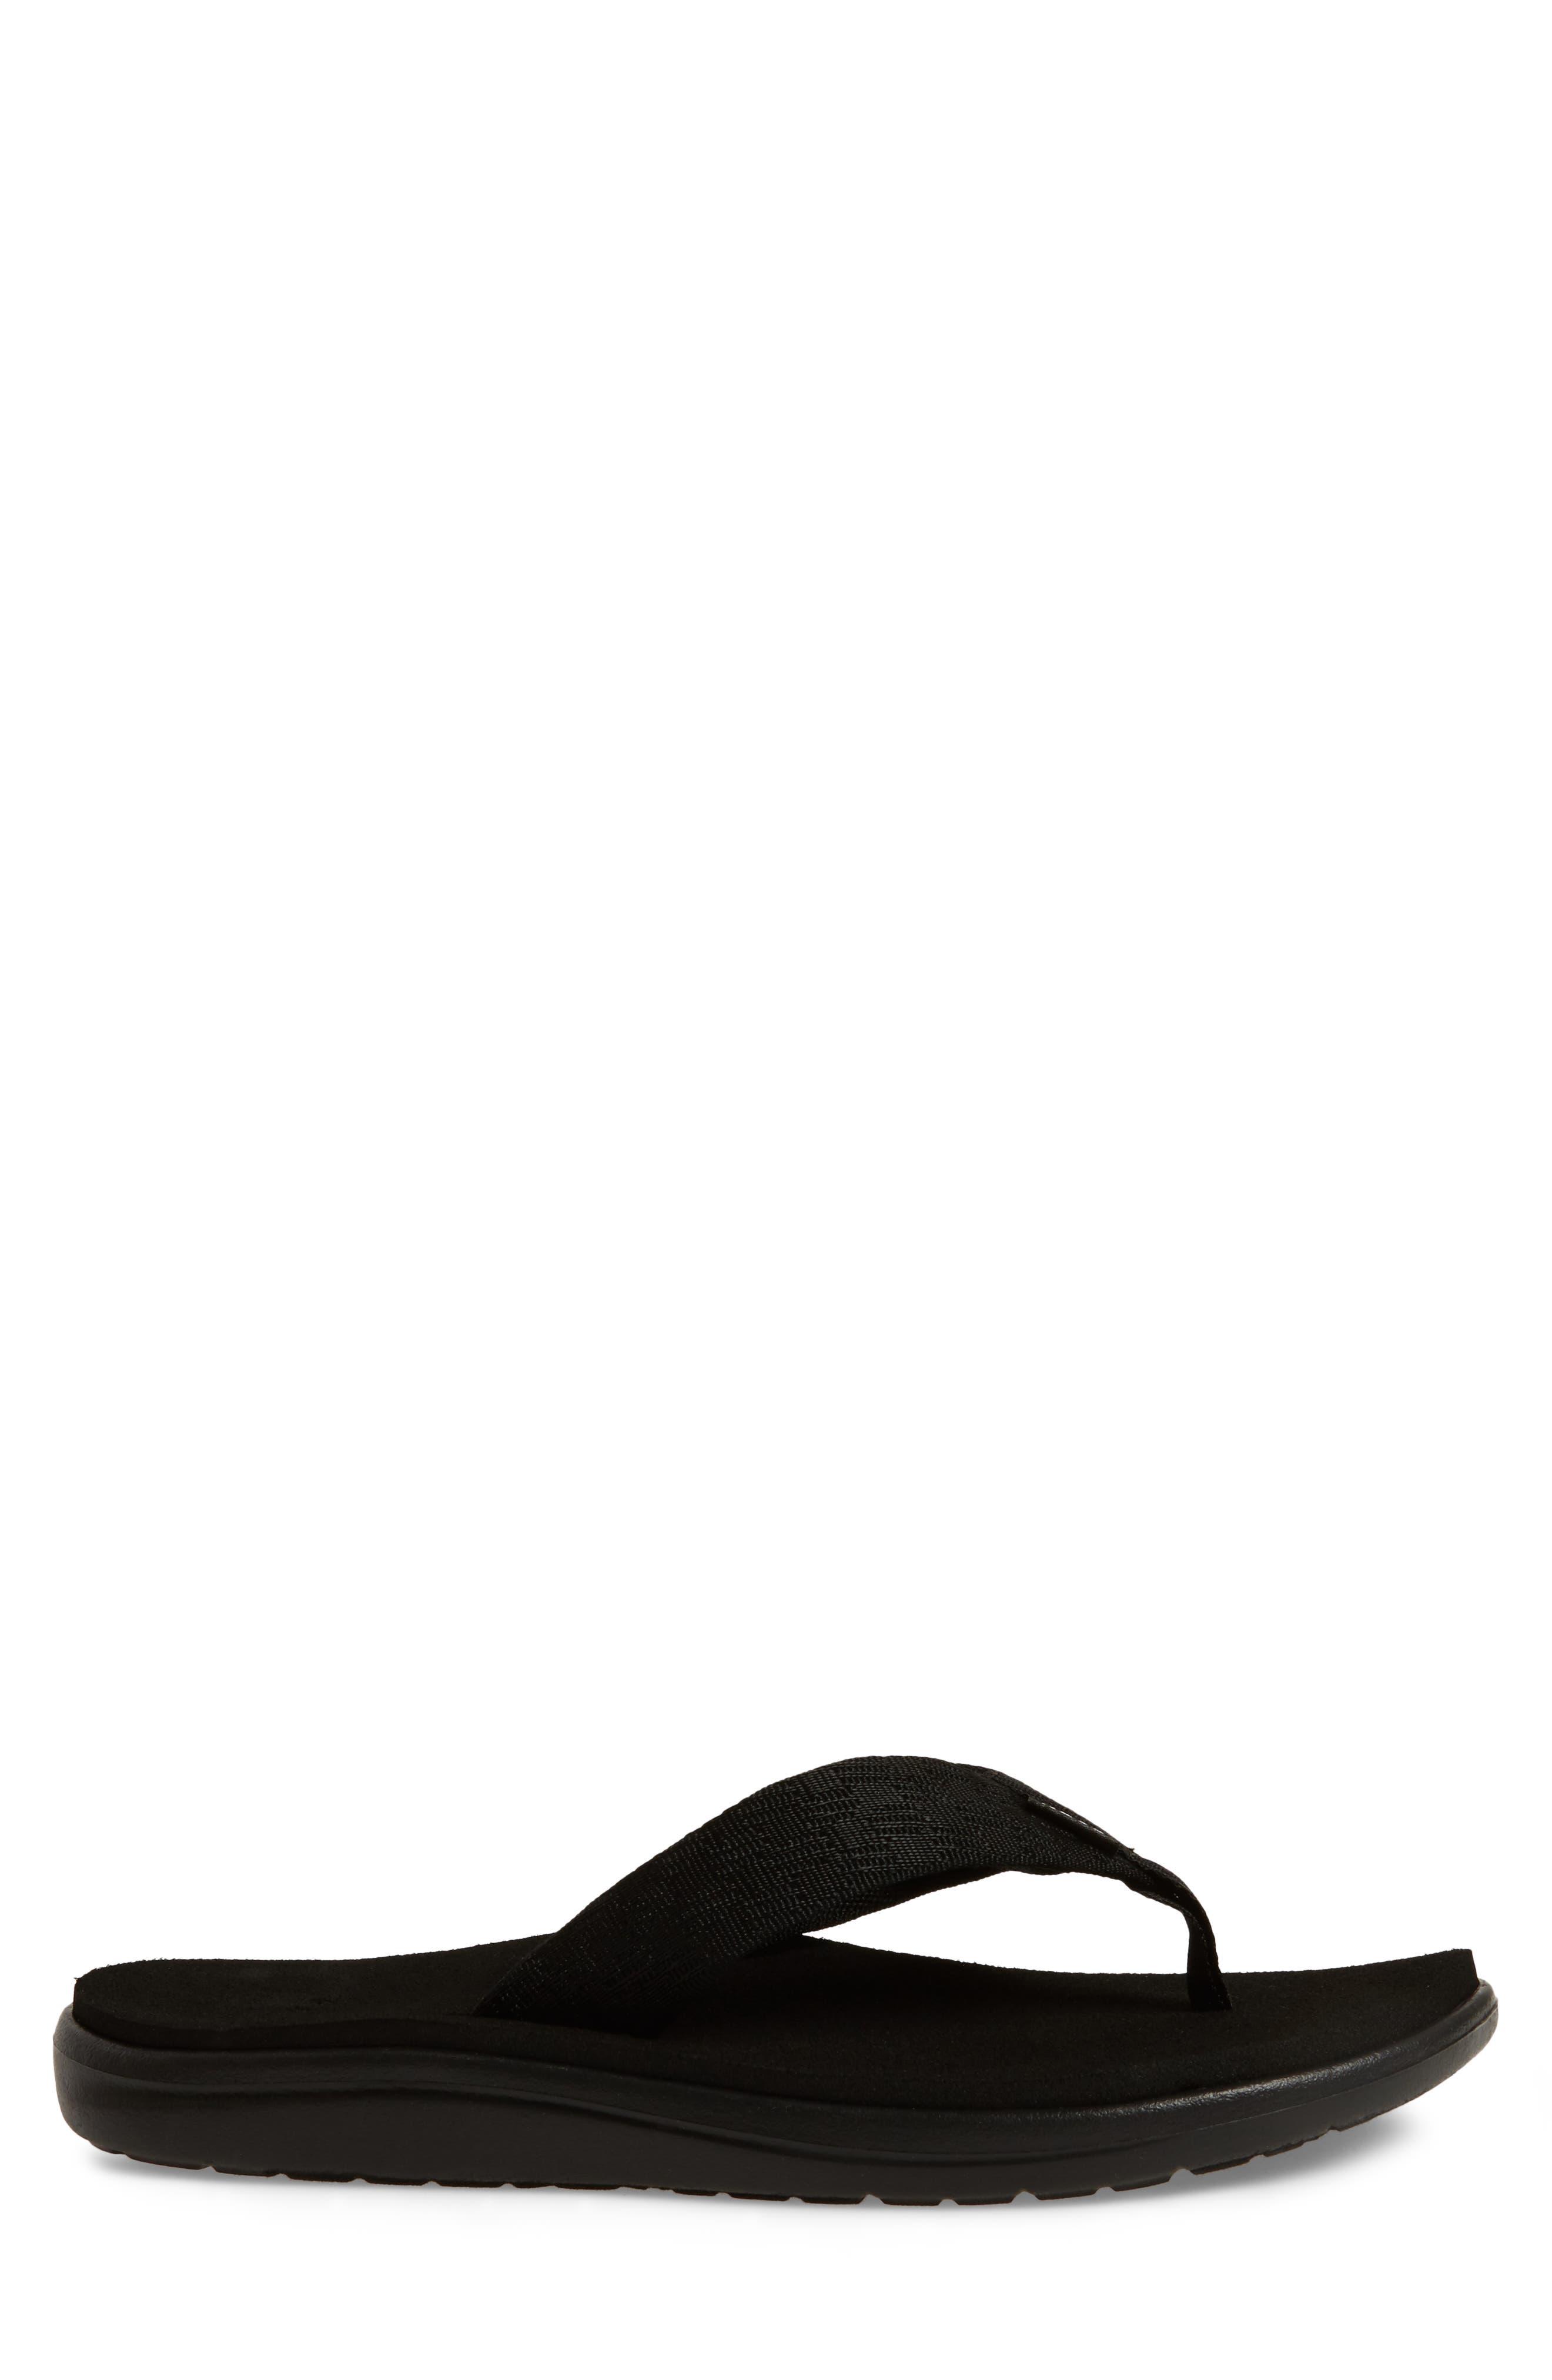 TEVA, Voya Flip Flop, Alternate thumbnail 3, color, BRICK BLACK NYLON